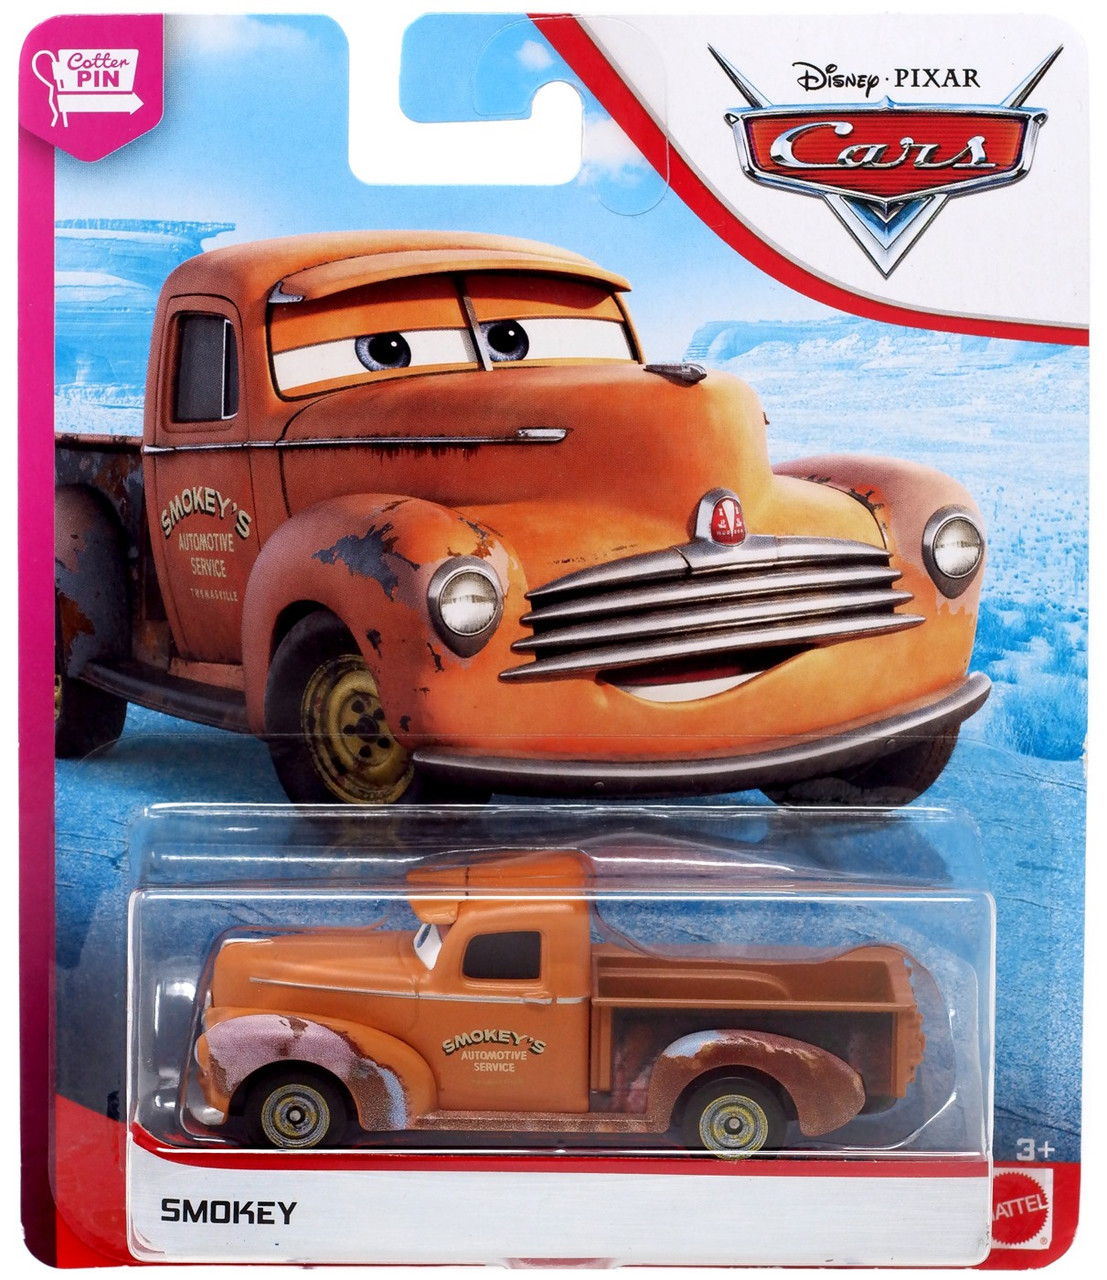 Disney Pixar Cars Cars 3 The Cotter Pin Smokey 155 Diecast Car